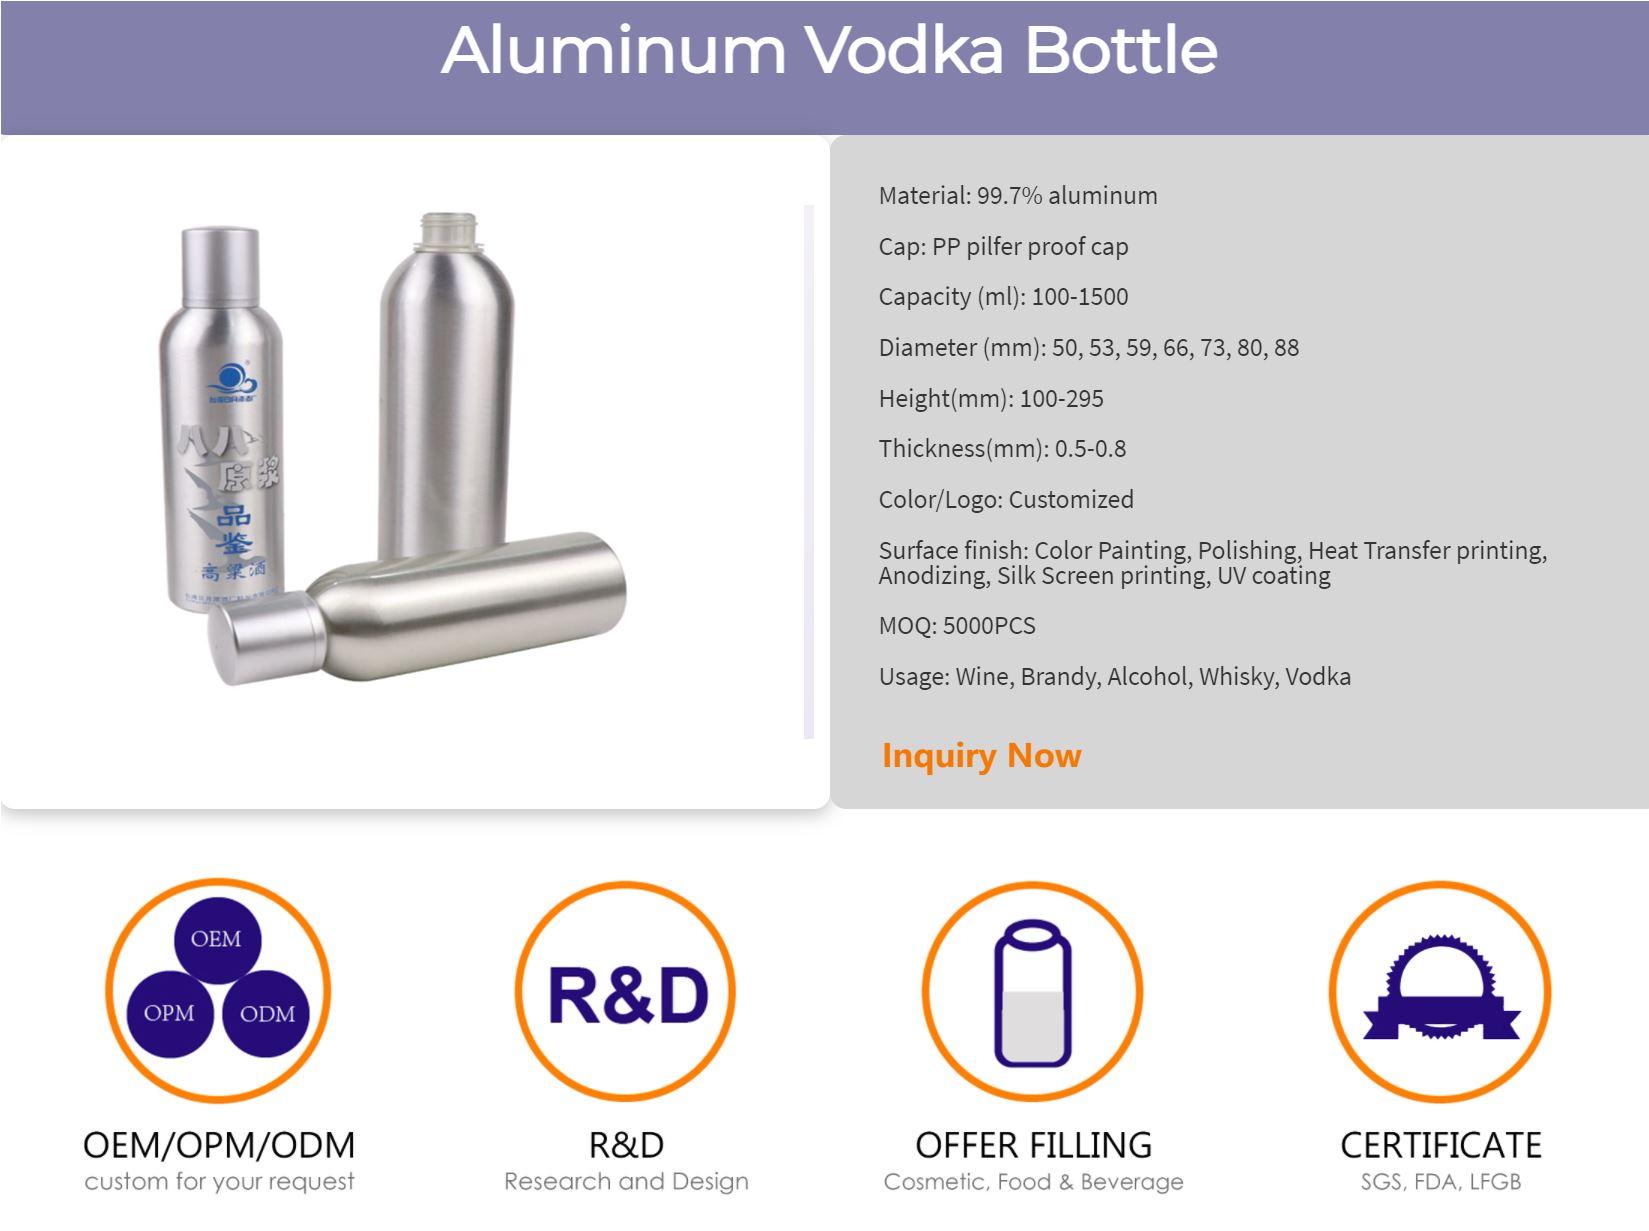 Aluminium Vodka Bottle.JPG